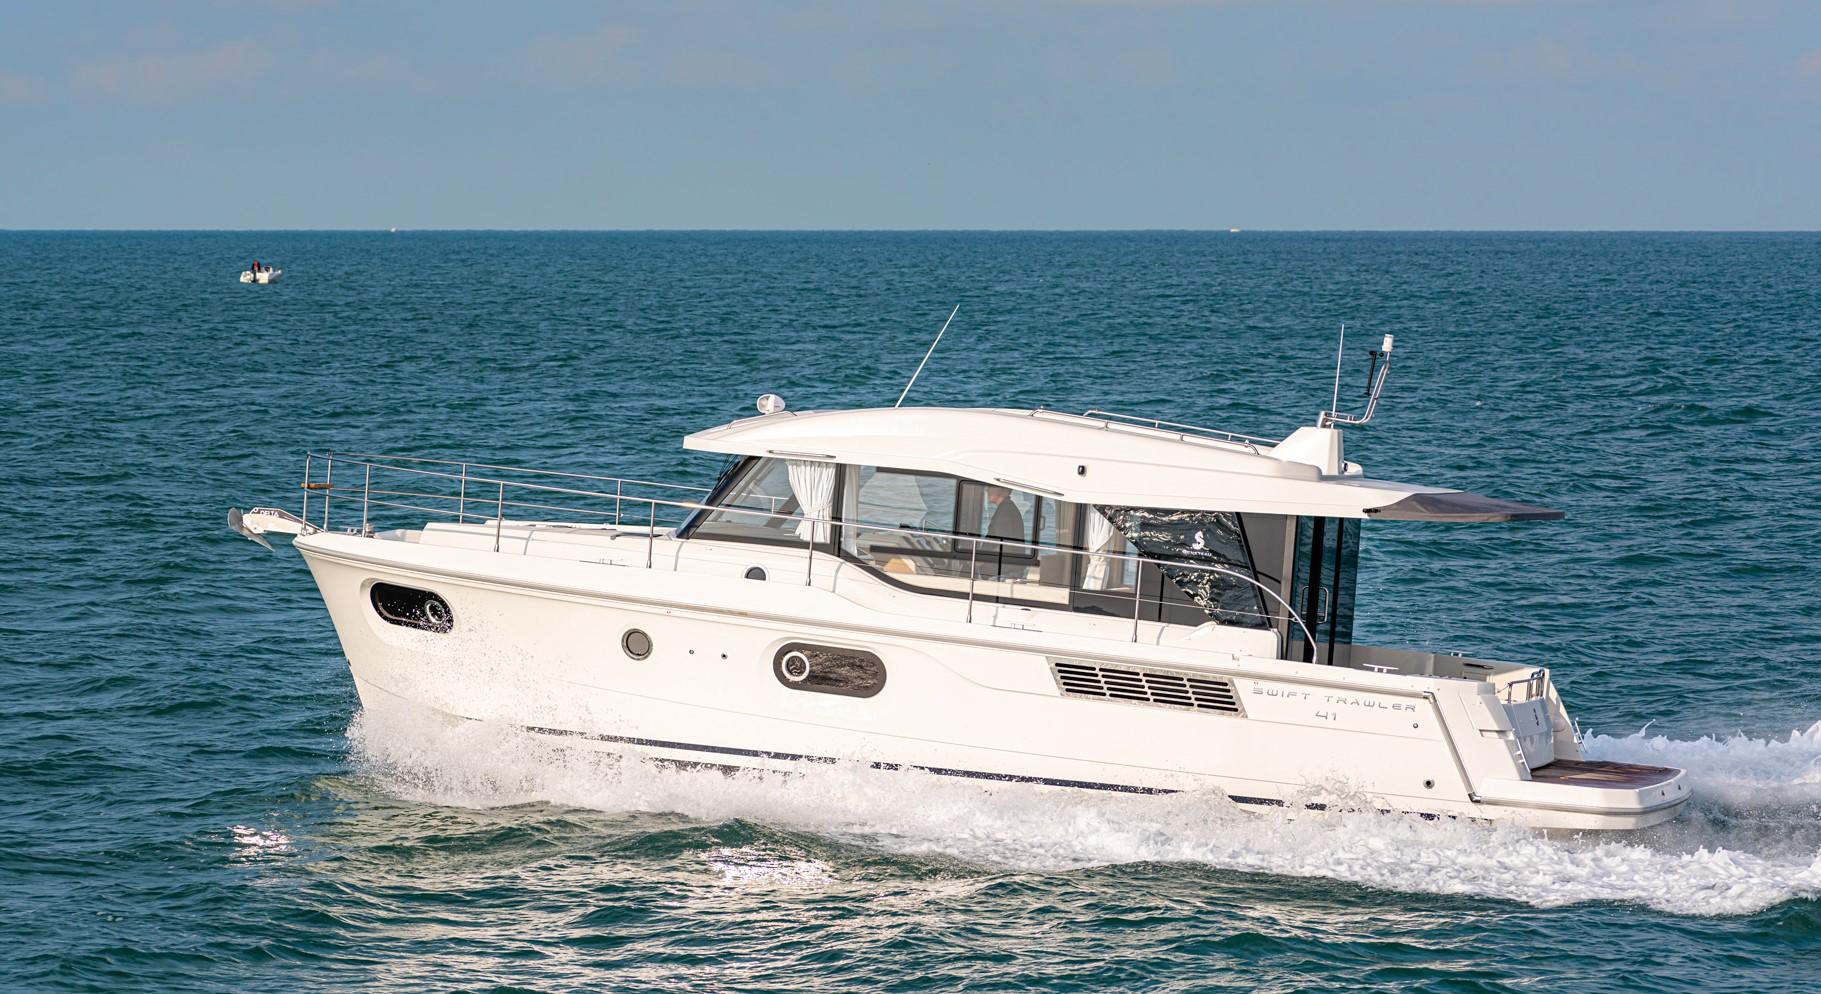 Beneteau Swift Trawler 41 Sedan Beneteau Swift Trawler 41 Sedan